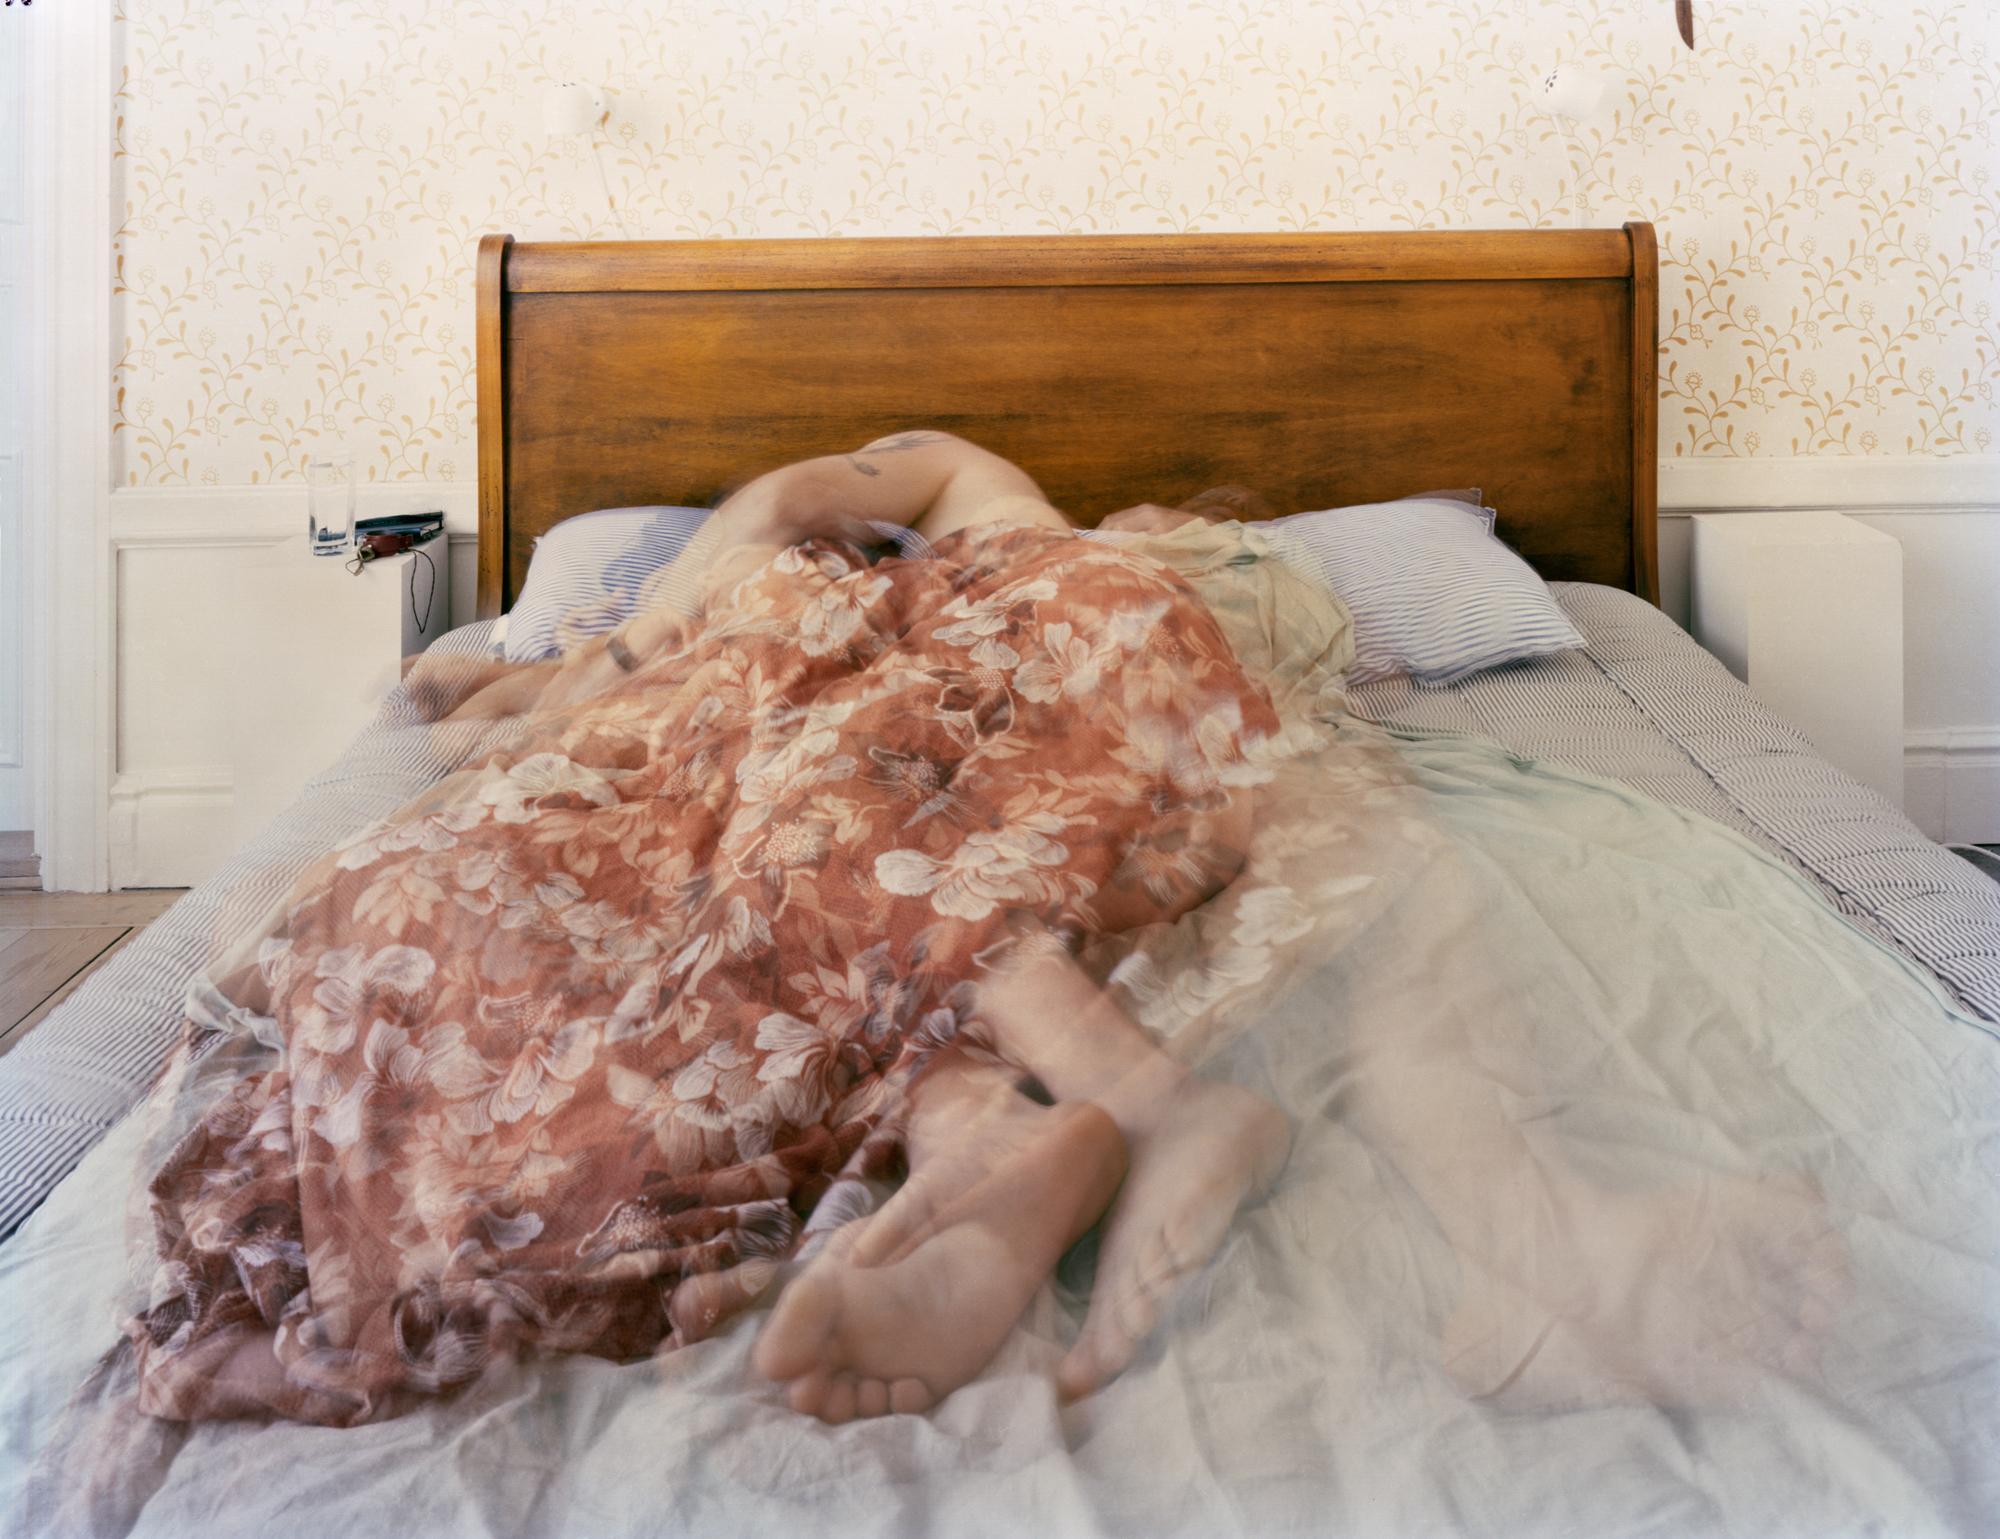 Long exposure figurative Photography: 'Illuminations No. 5'